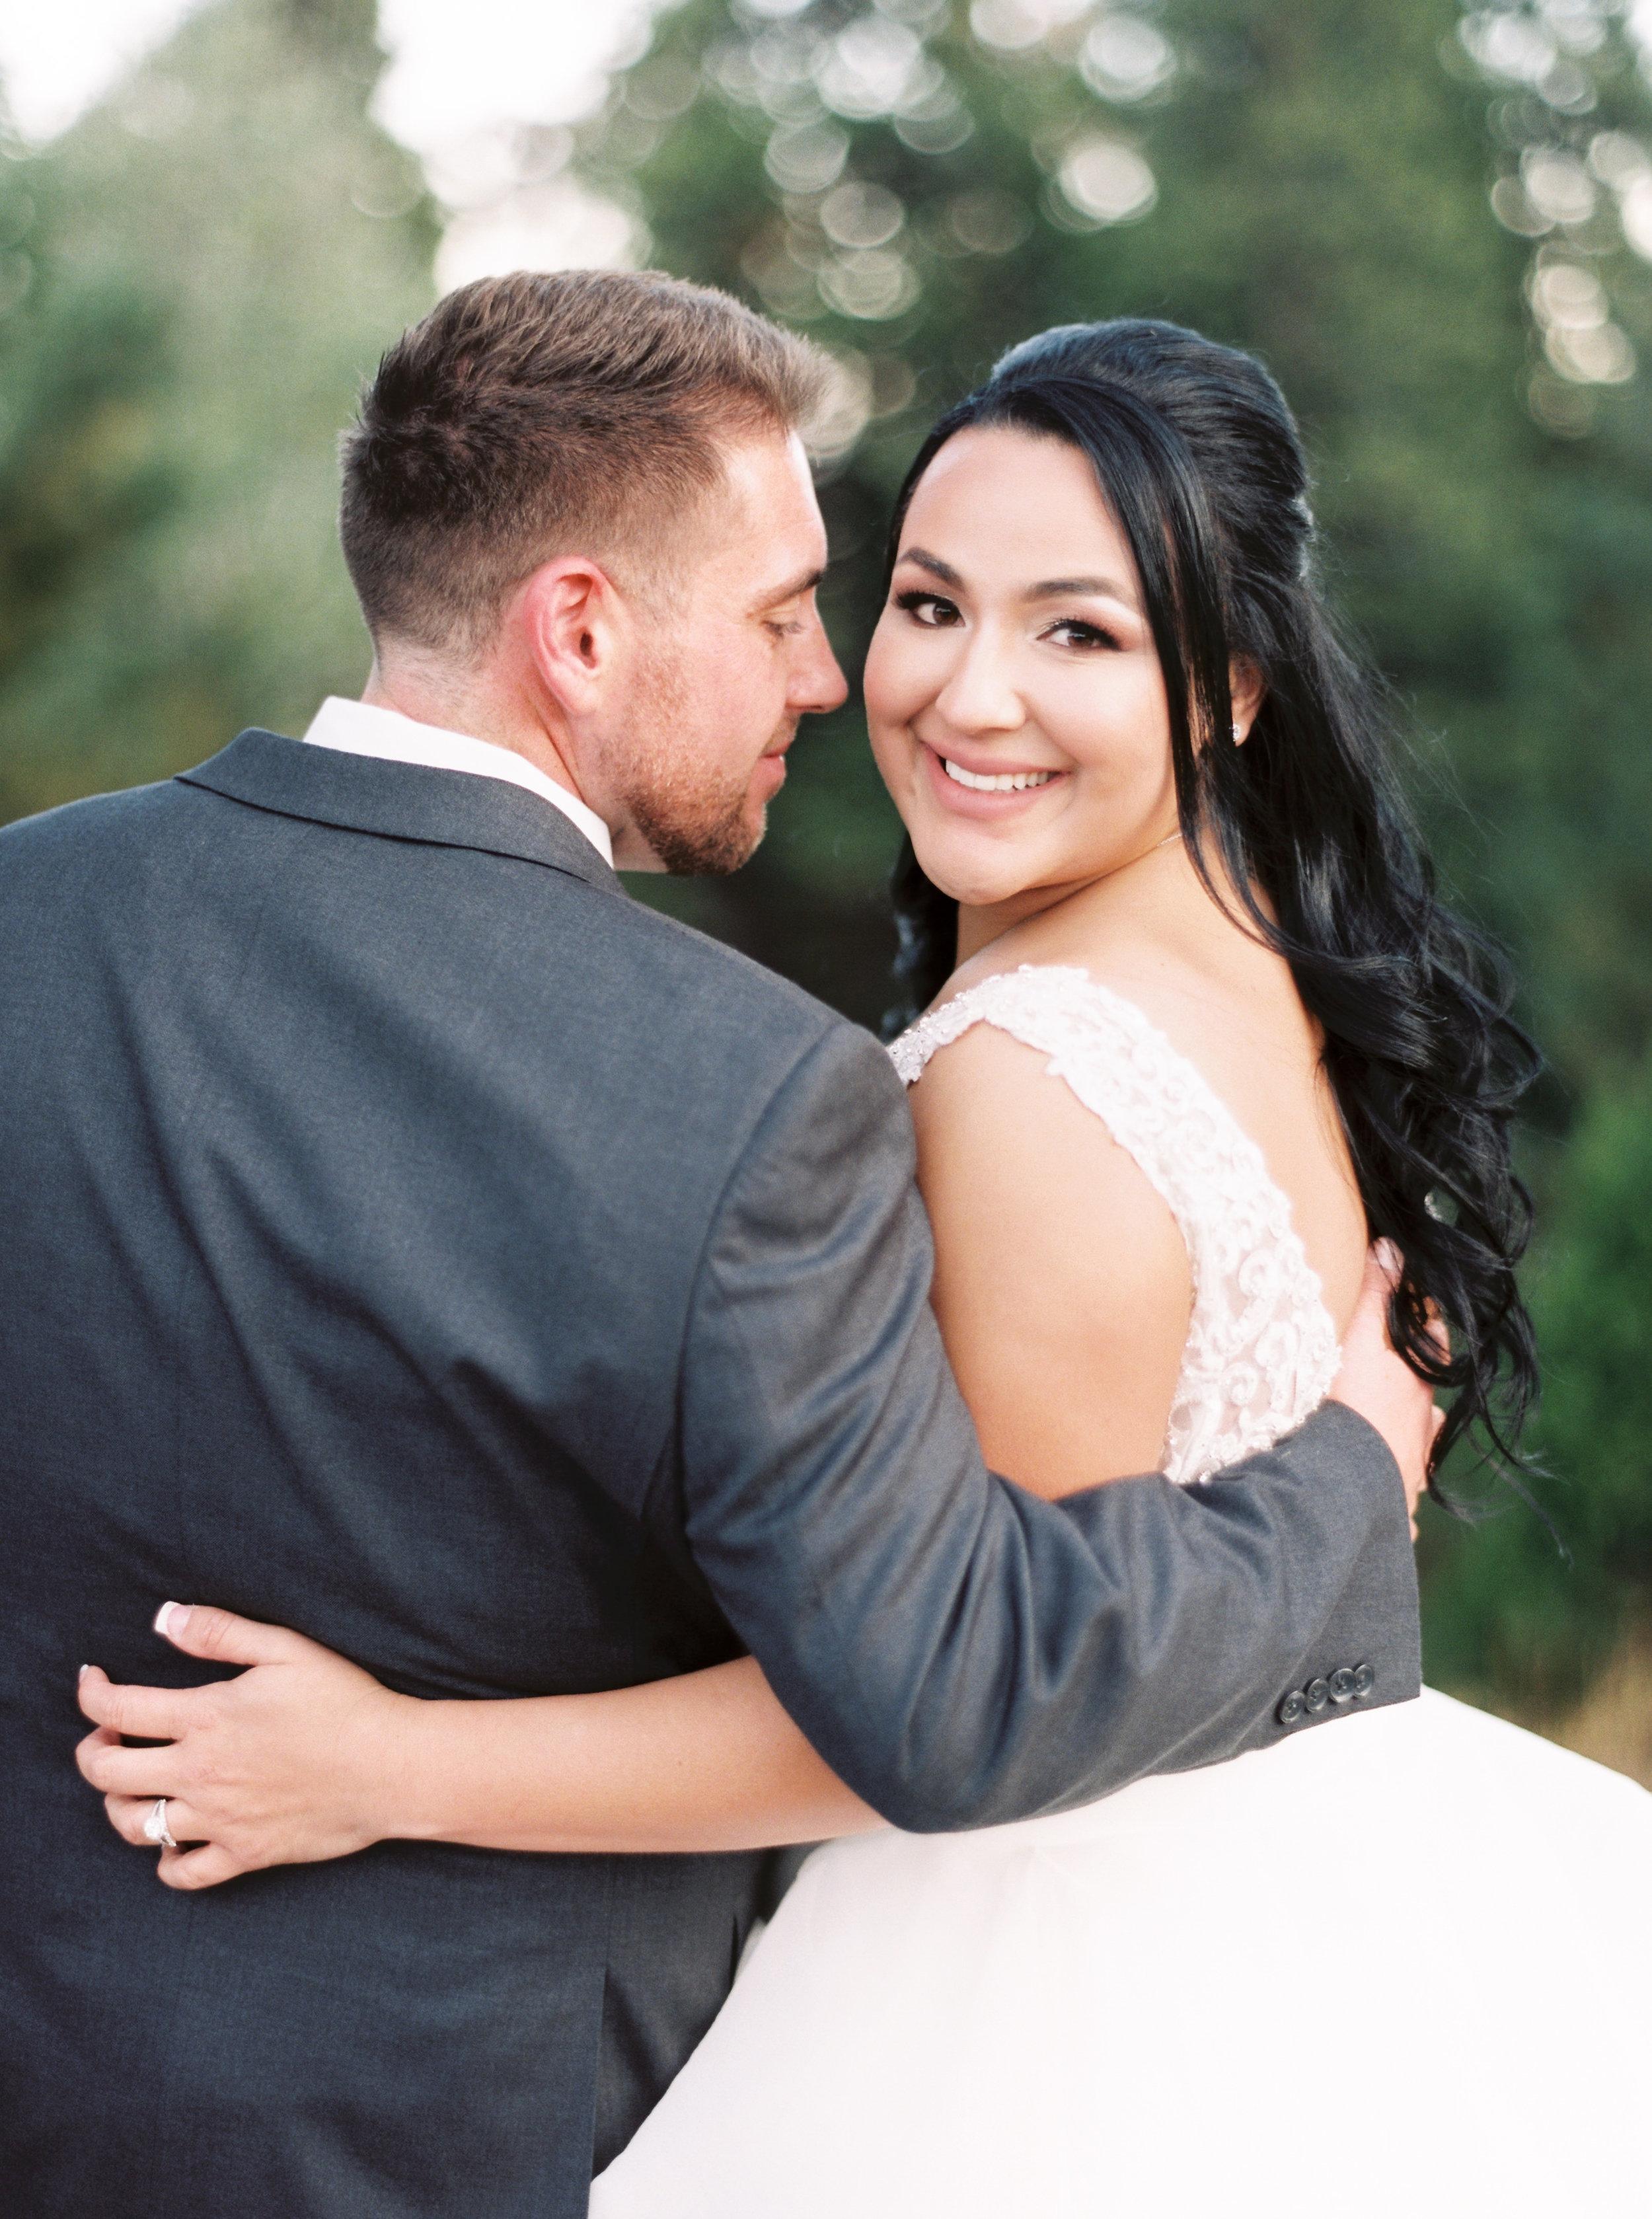 Tenaya-lodge-wedding-at-yosemite-national-park-california-9.jpg